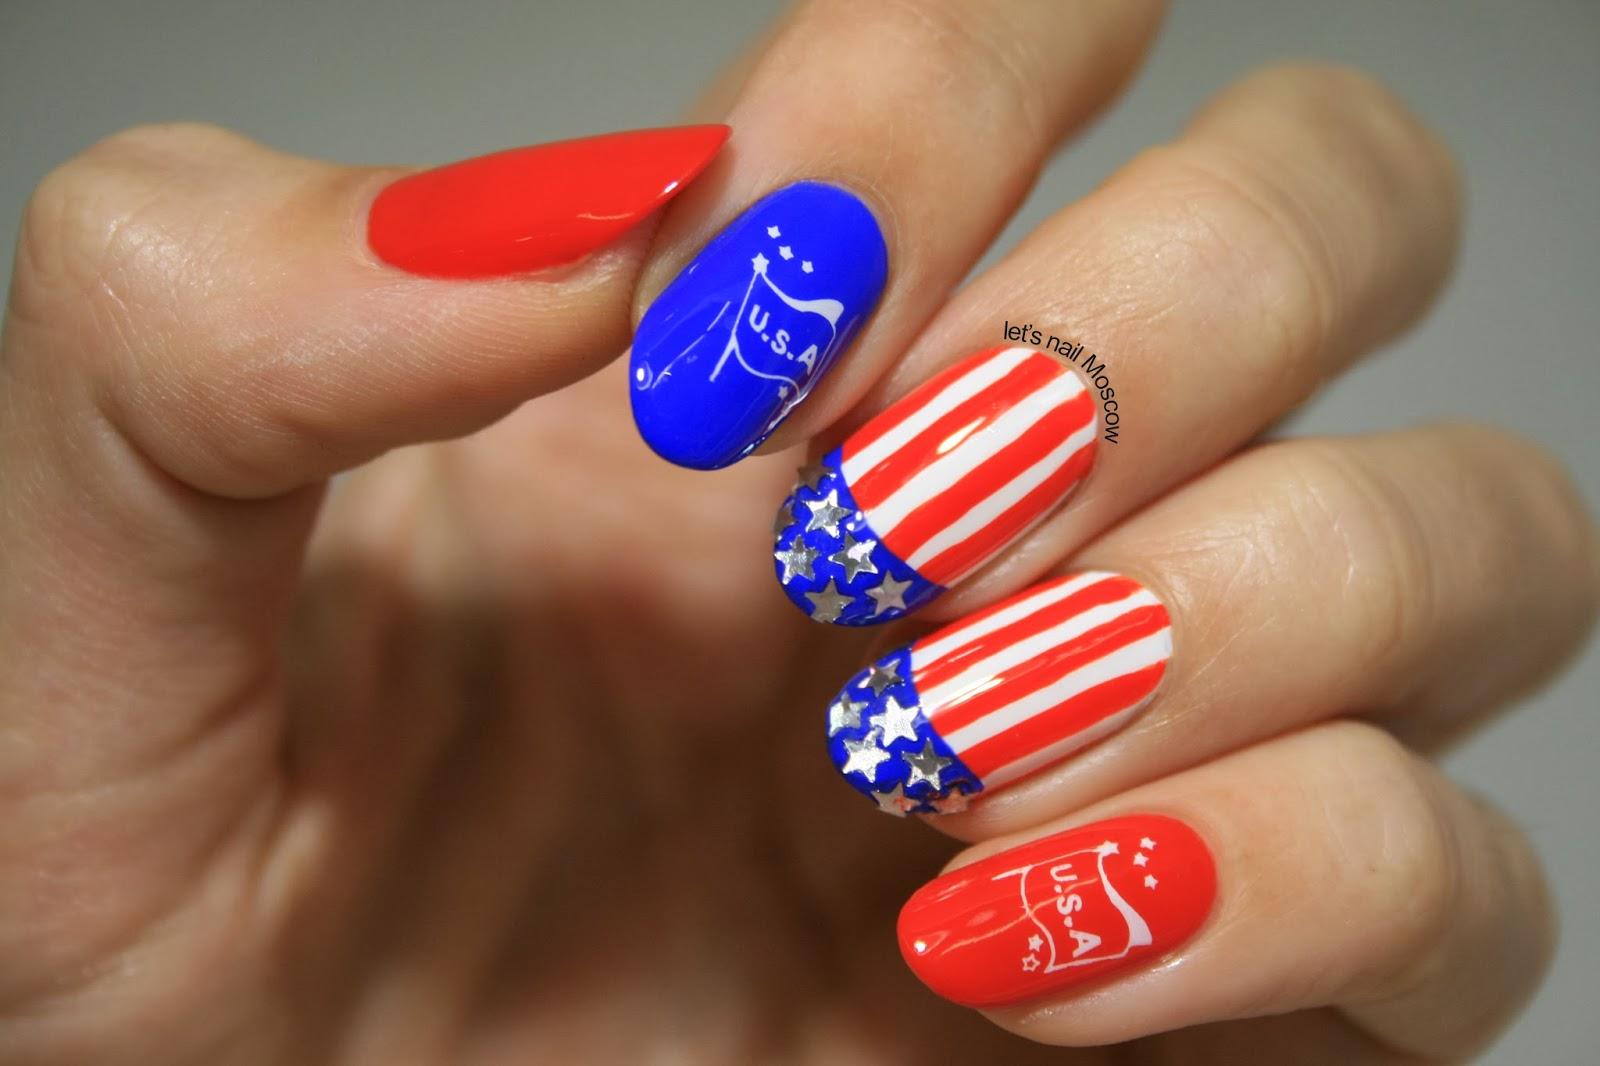 Маникюр на ногтях российский флаг